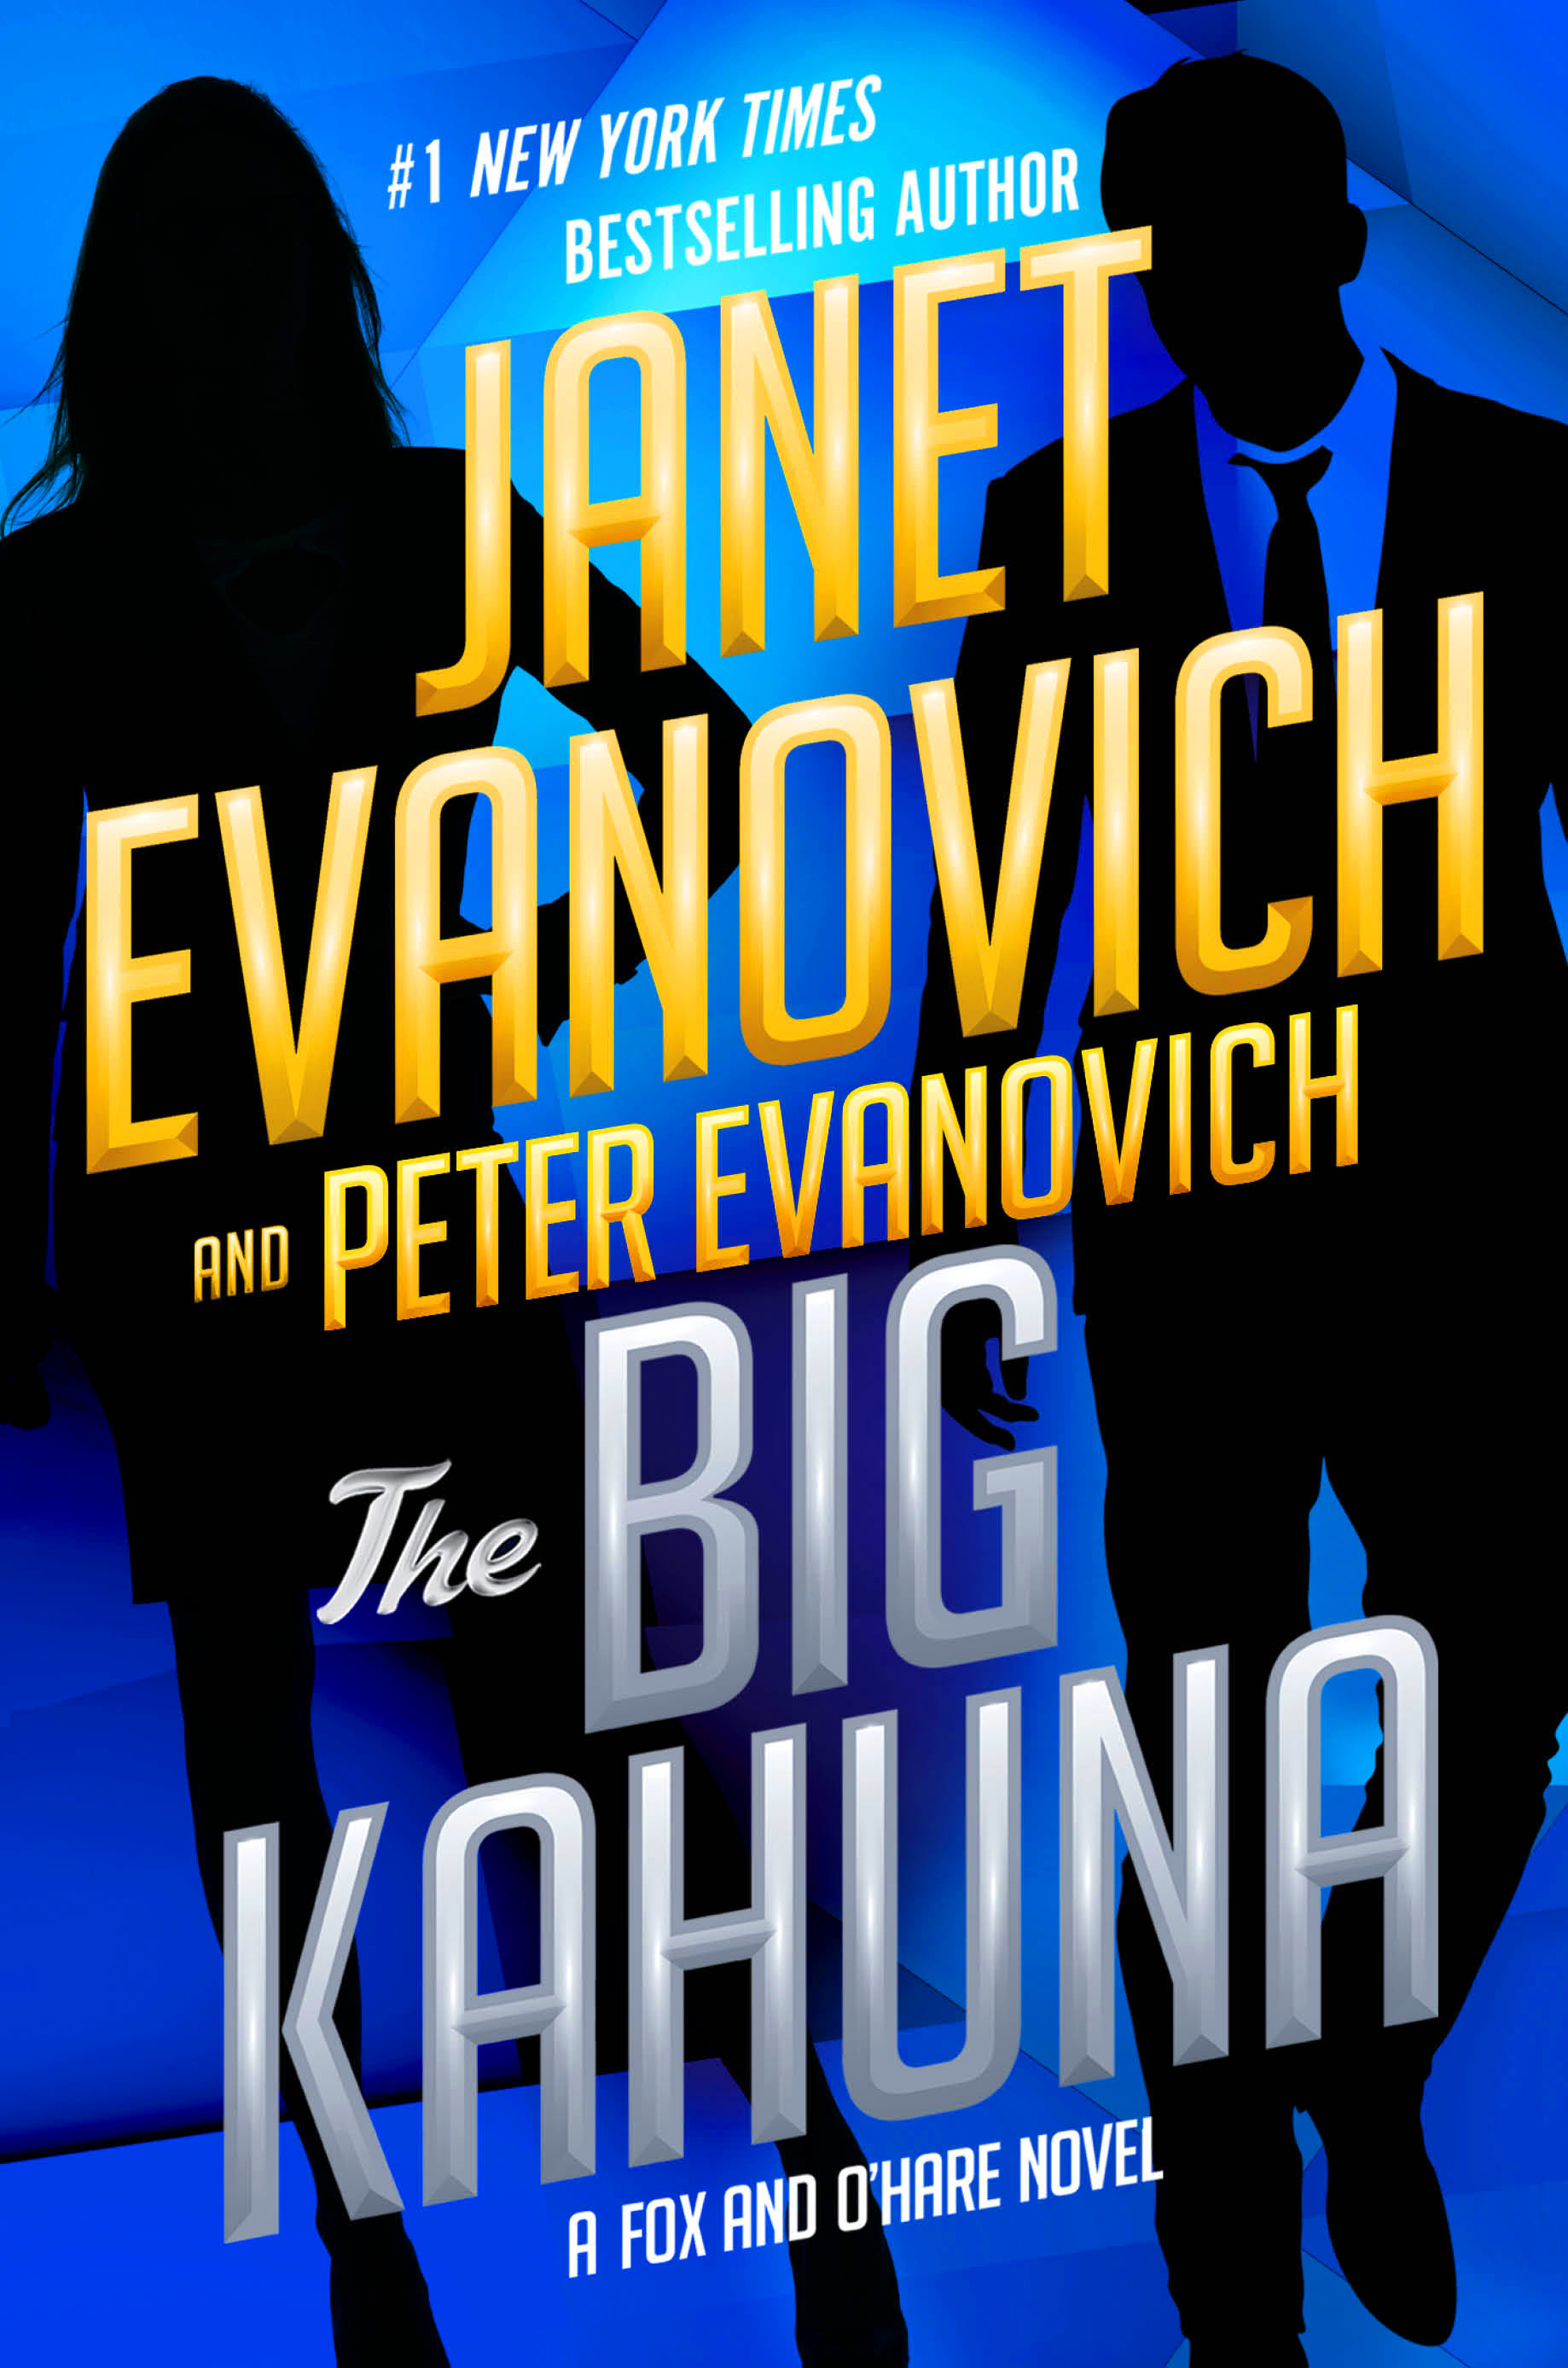 The Big Kahuna cover image